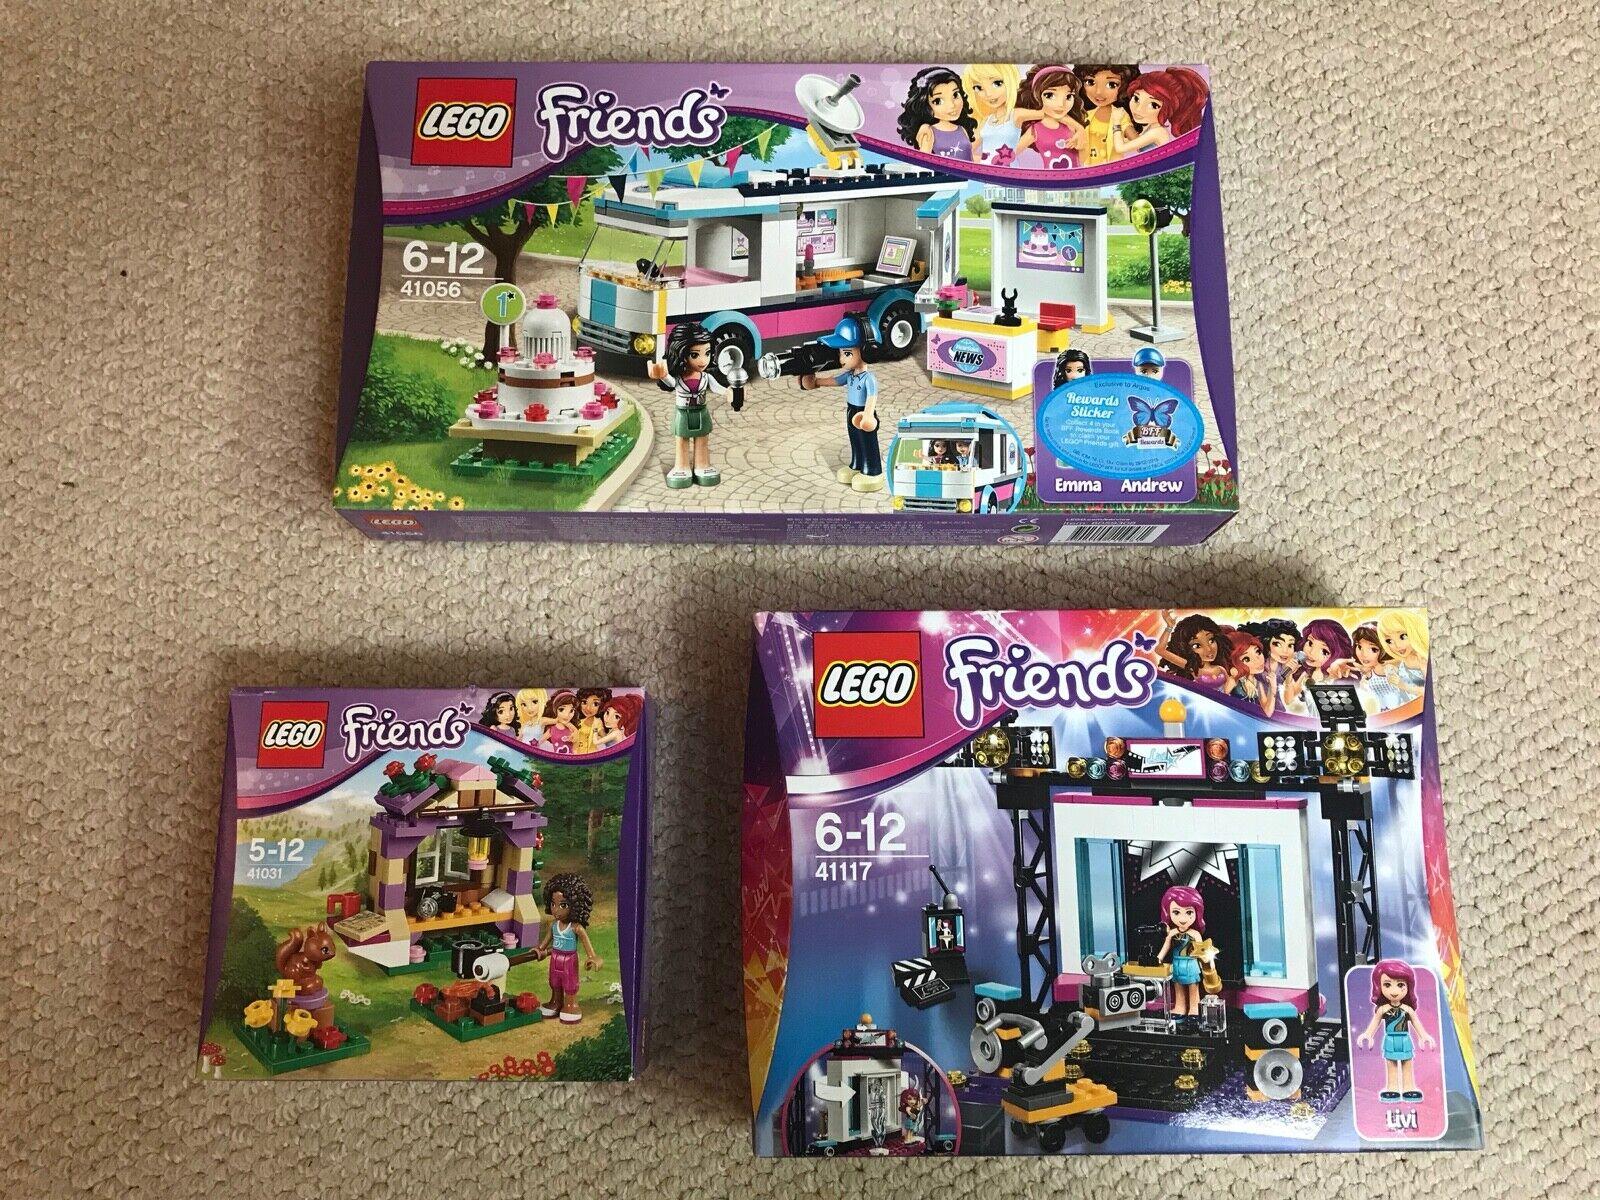 NEW - LEGO Friends Bundle - 41031 41056 41117 - ALL BNIB + Free P&P